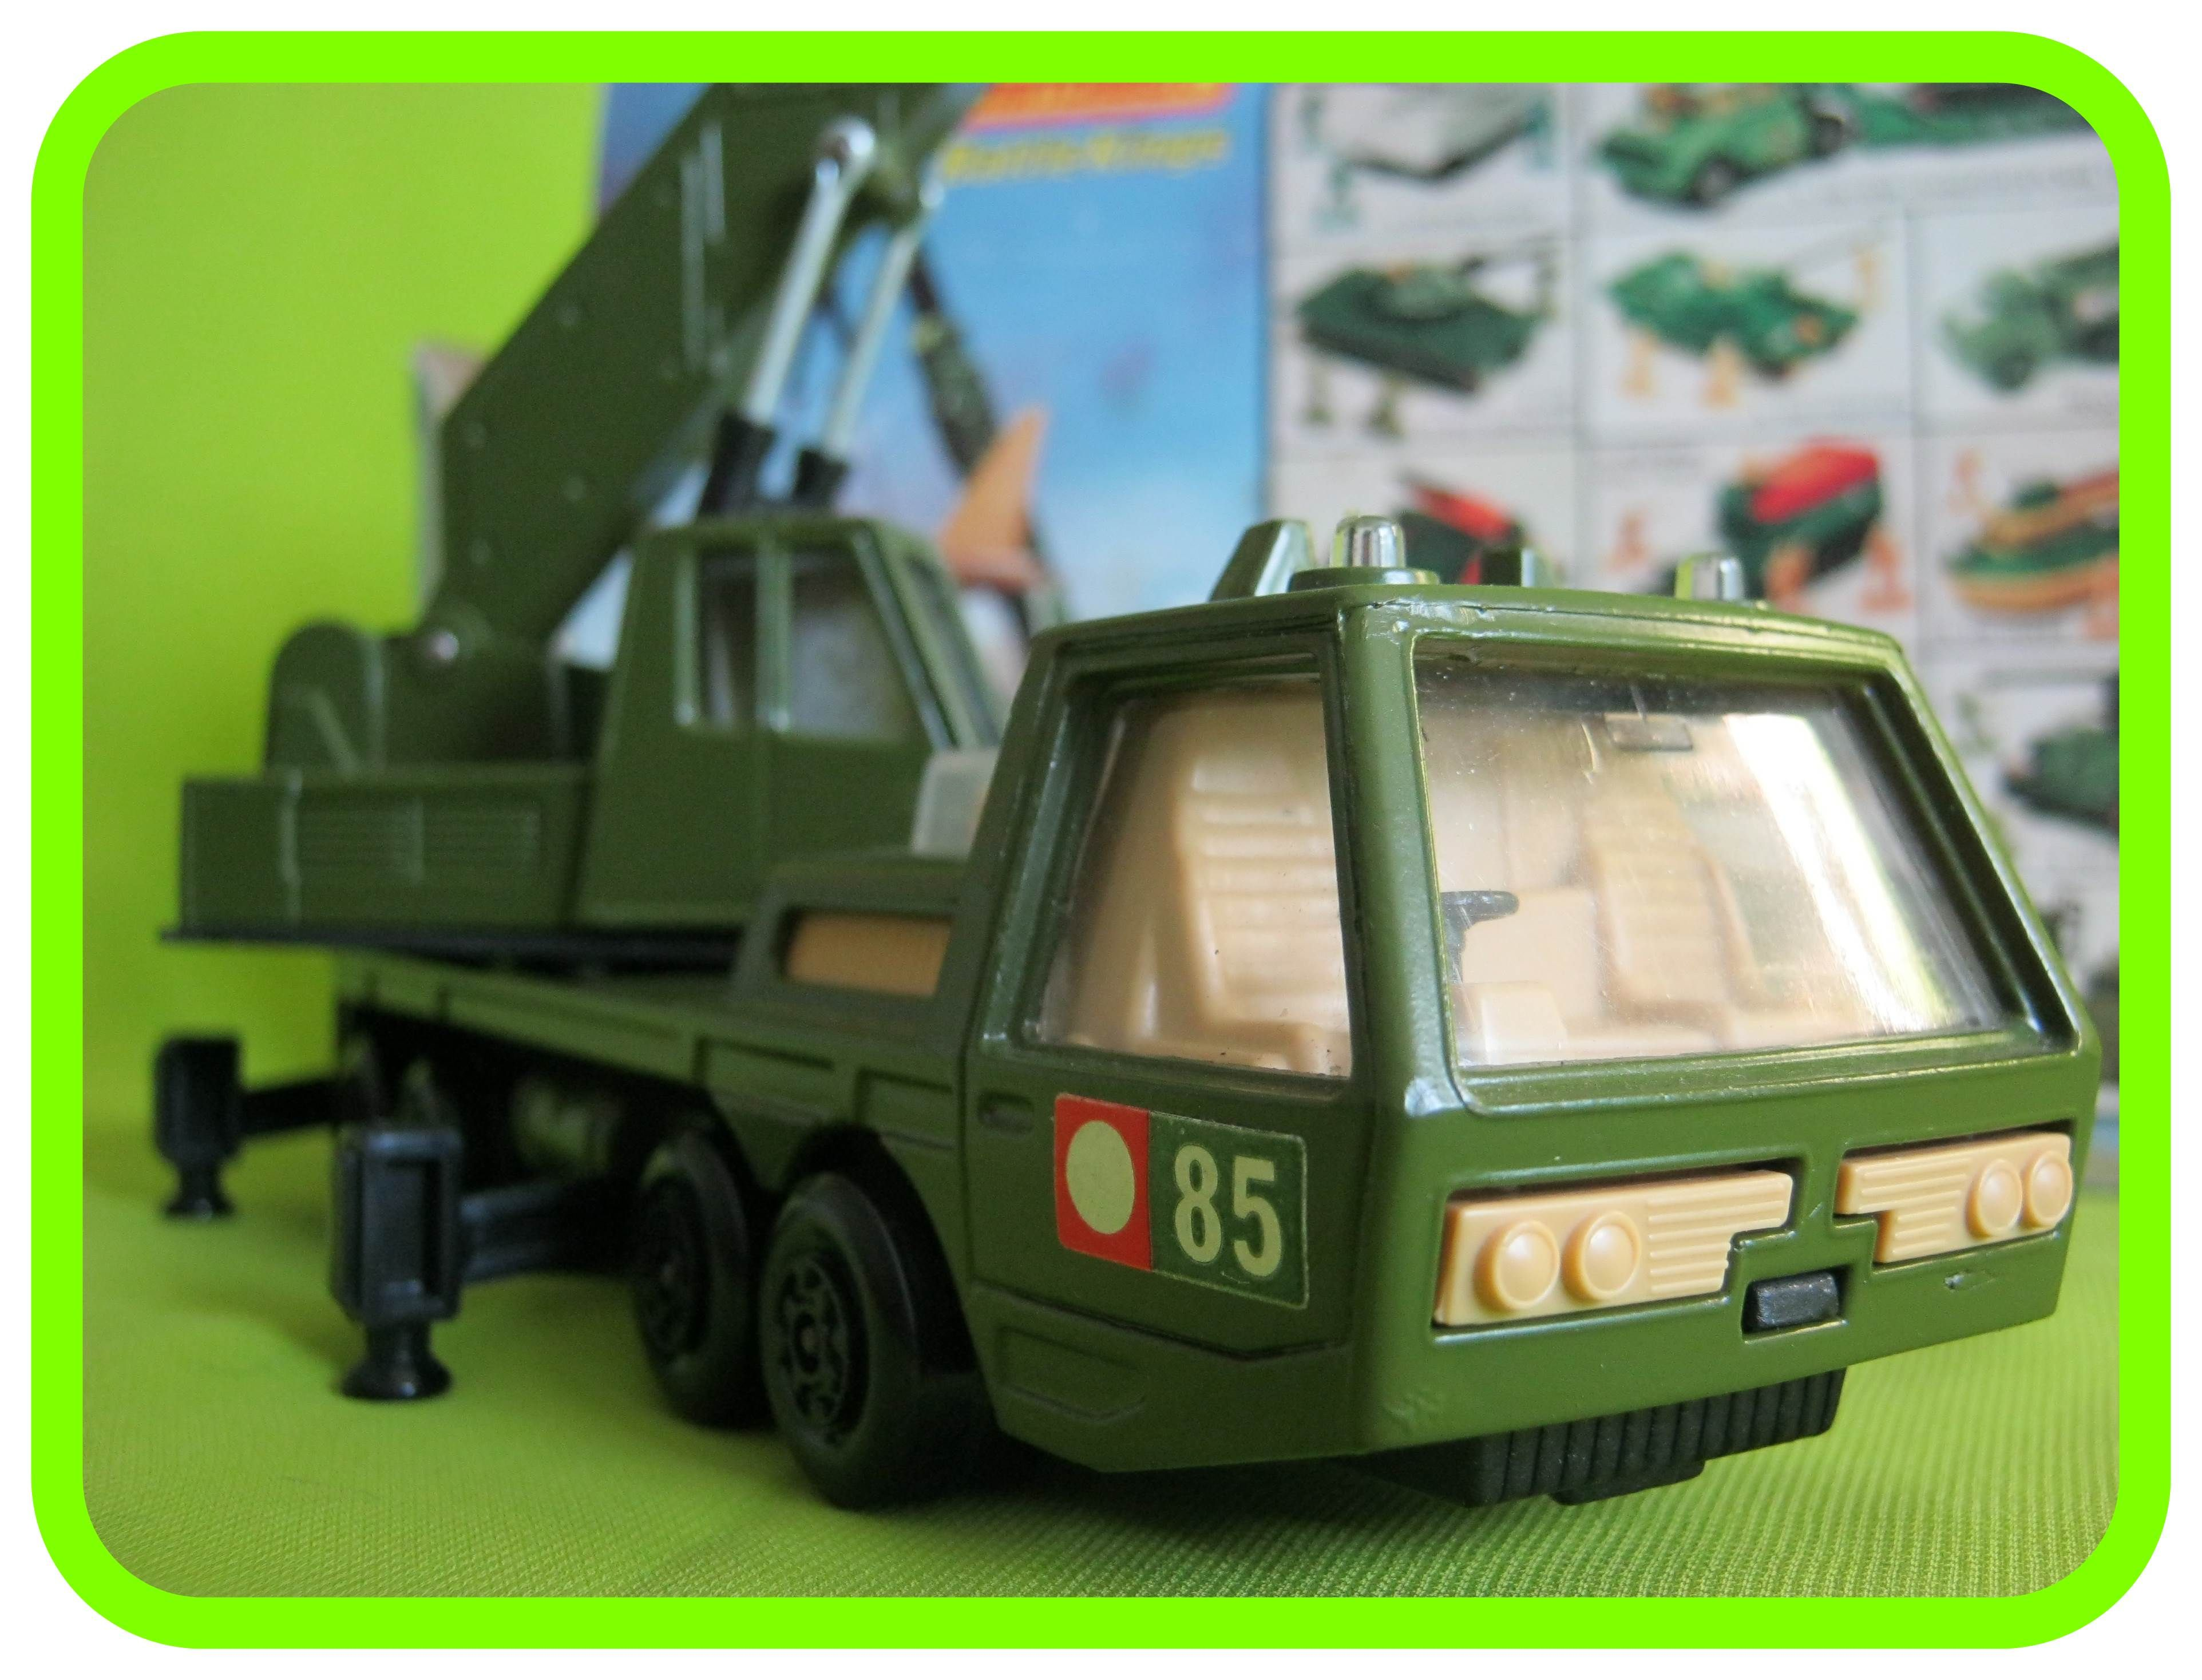 K113 Armoured Mobile Crane Mattel hot wheels, Toys r us kids